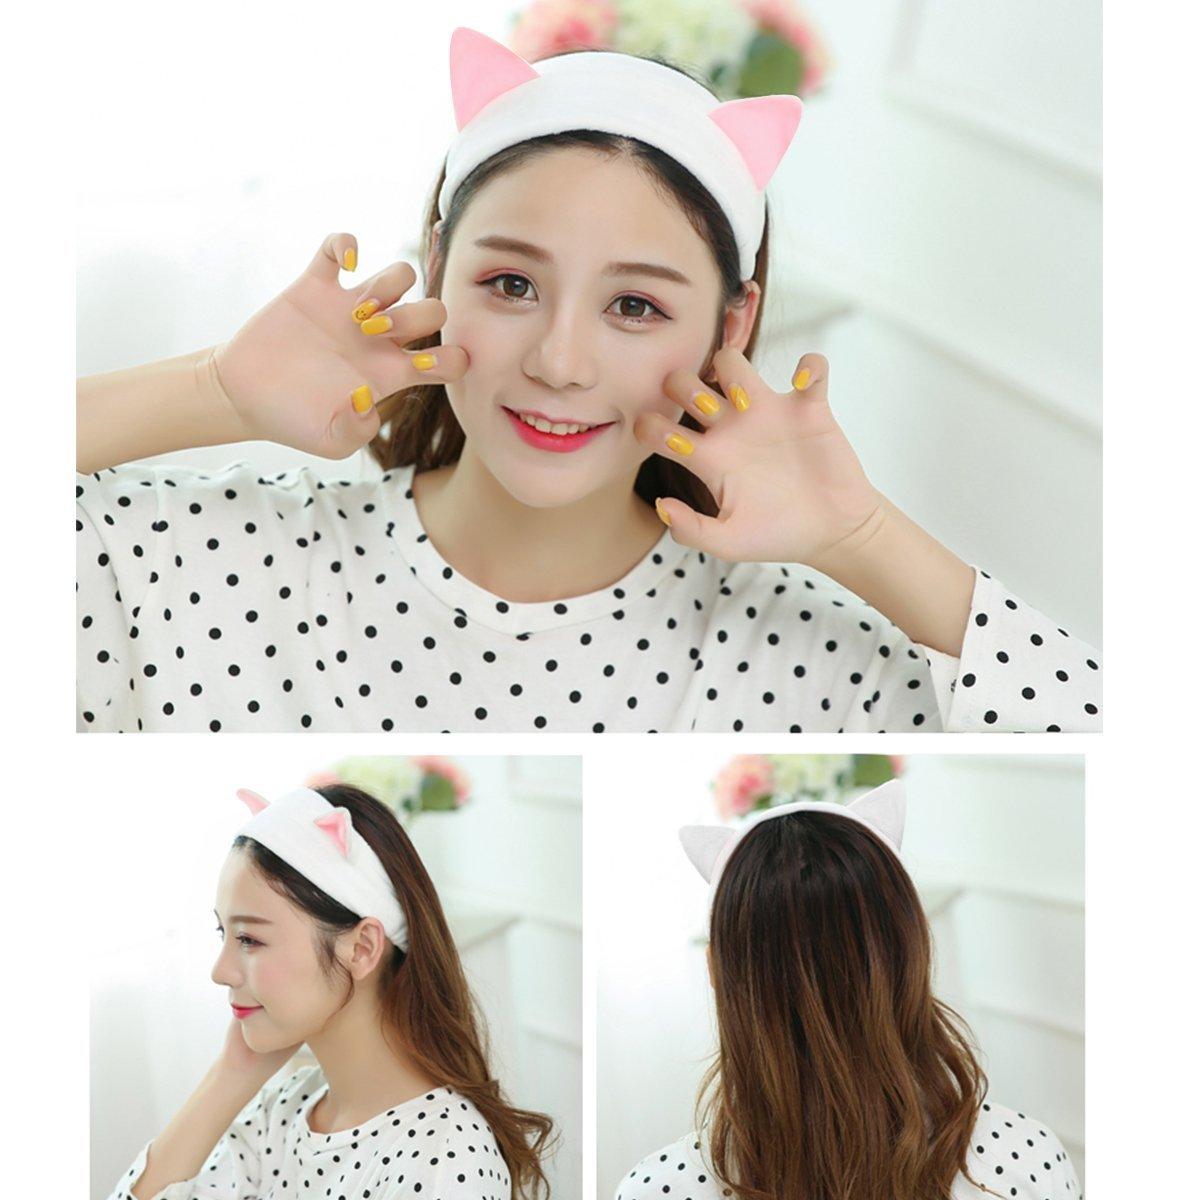 Women's Cat Ear Headband - Fashionable Cute Fluffy Elastic Makeup Headband Hairband for Shower